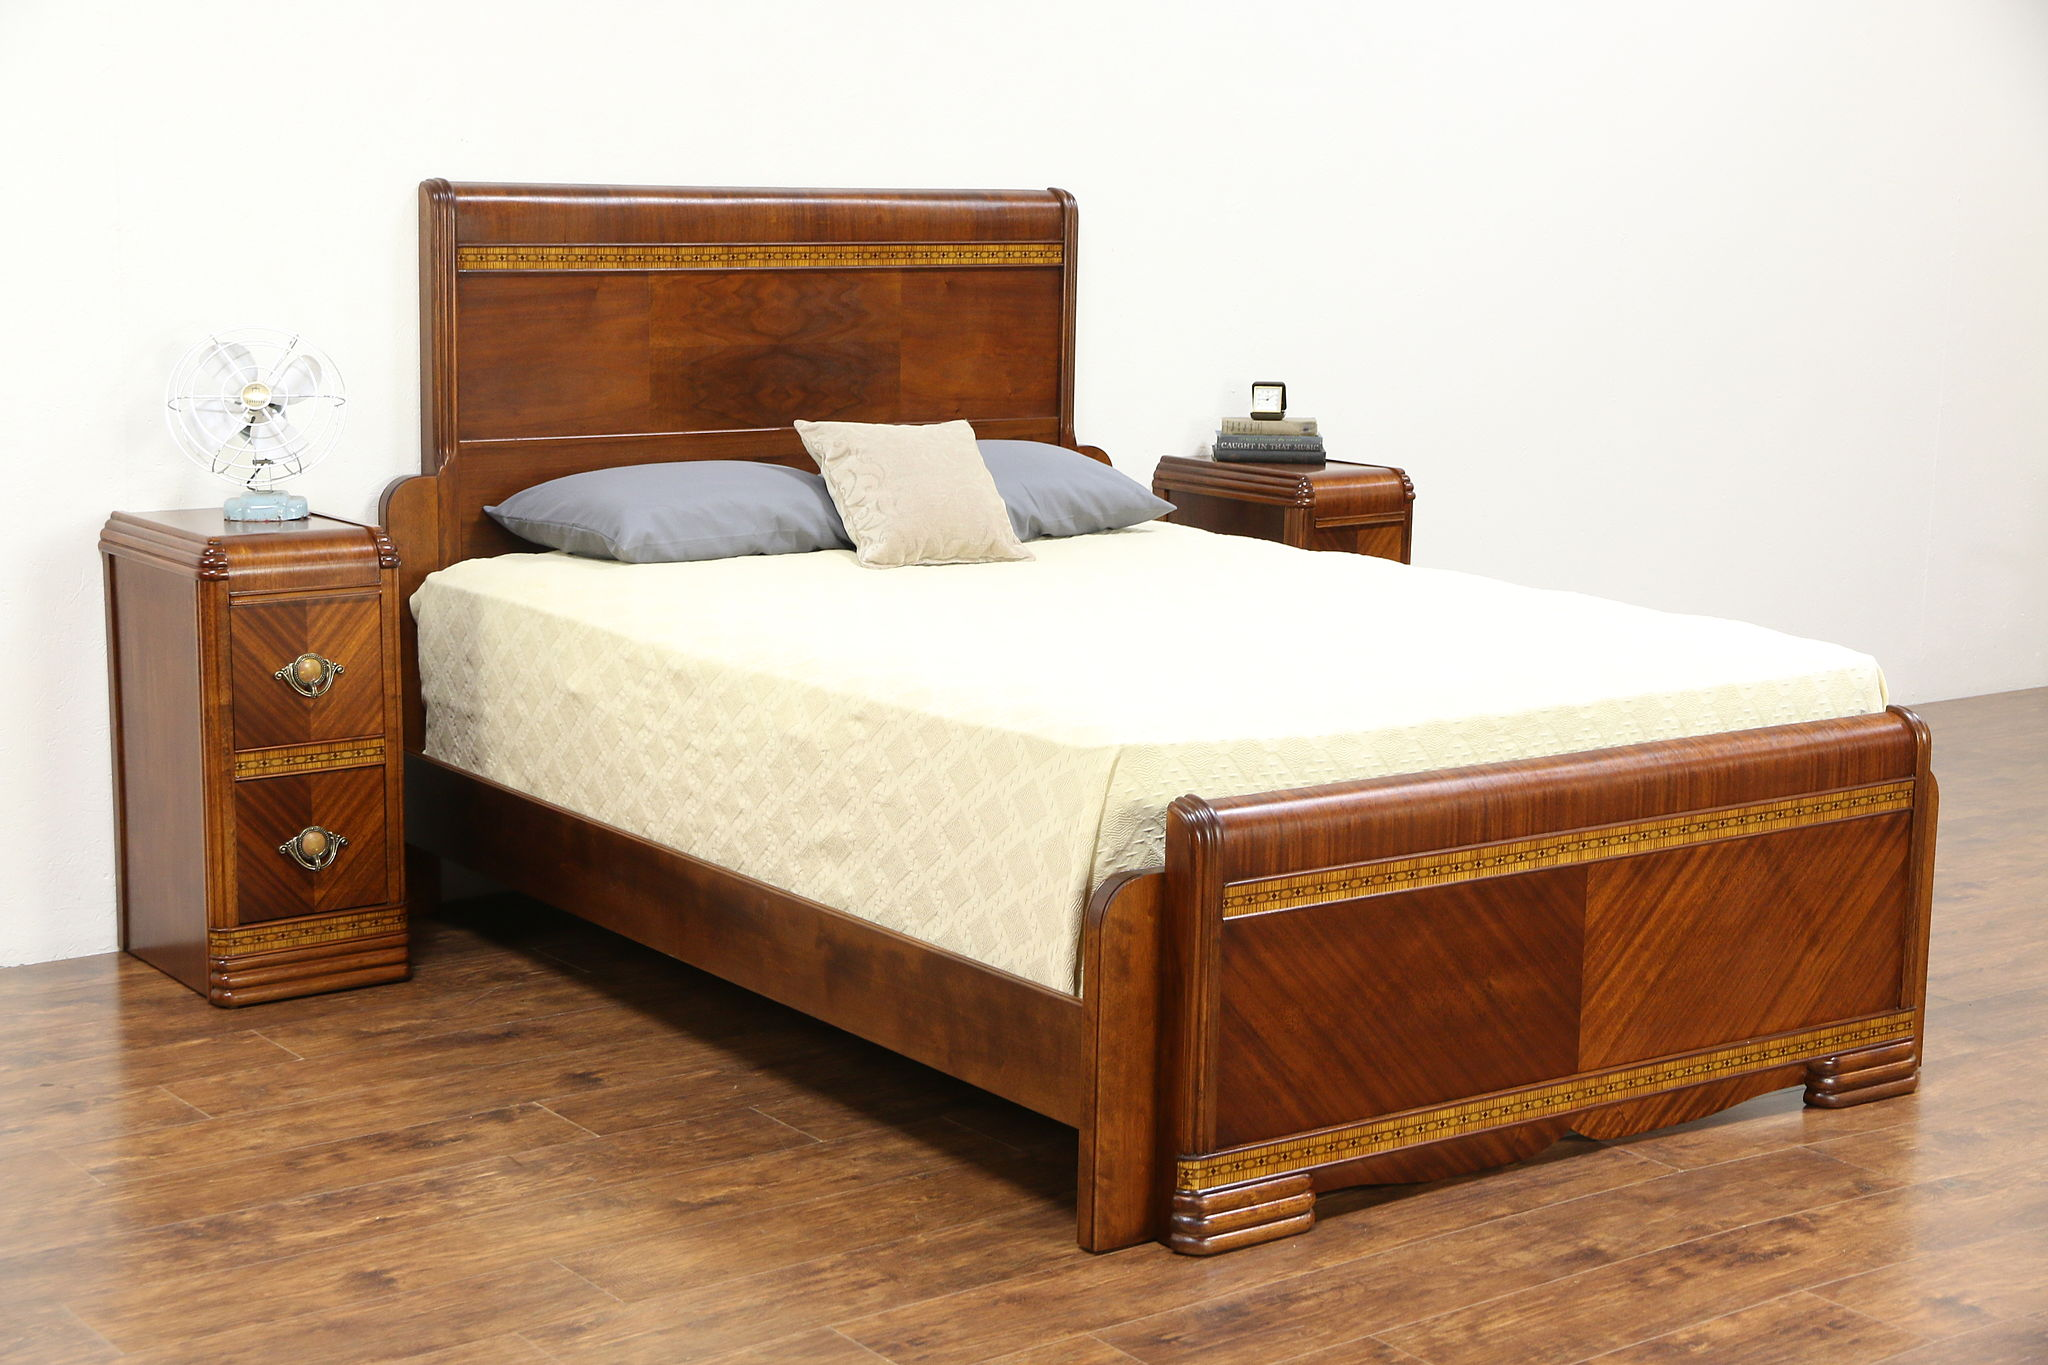 Sold Art Deco Waterfall Bedroom Set 1935 Vintage Queen Size Bed Pair Nightstands Harp Gallery Antiques Furniture